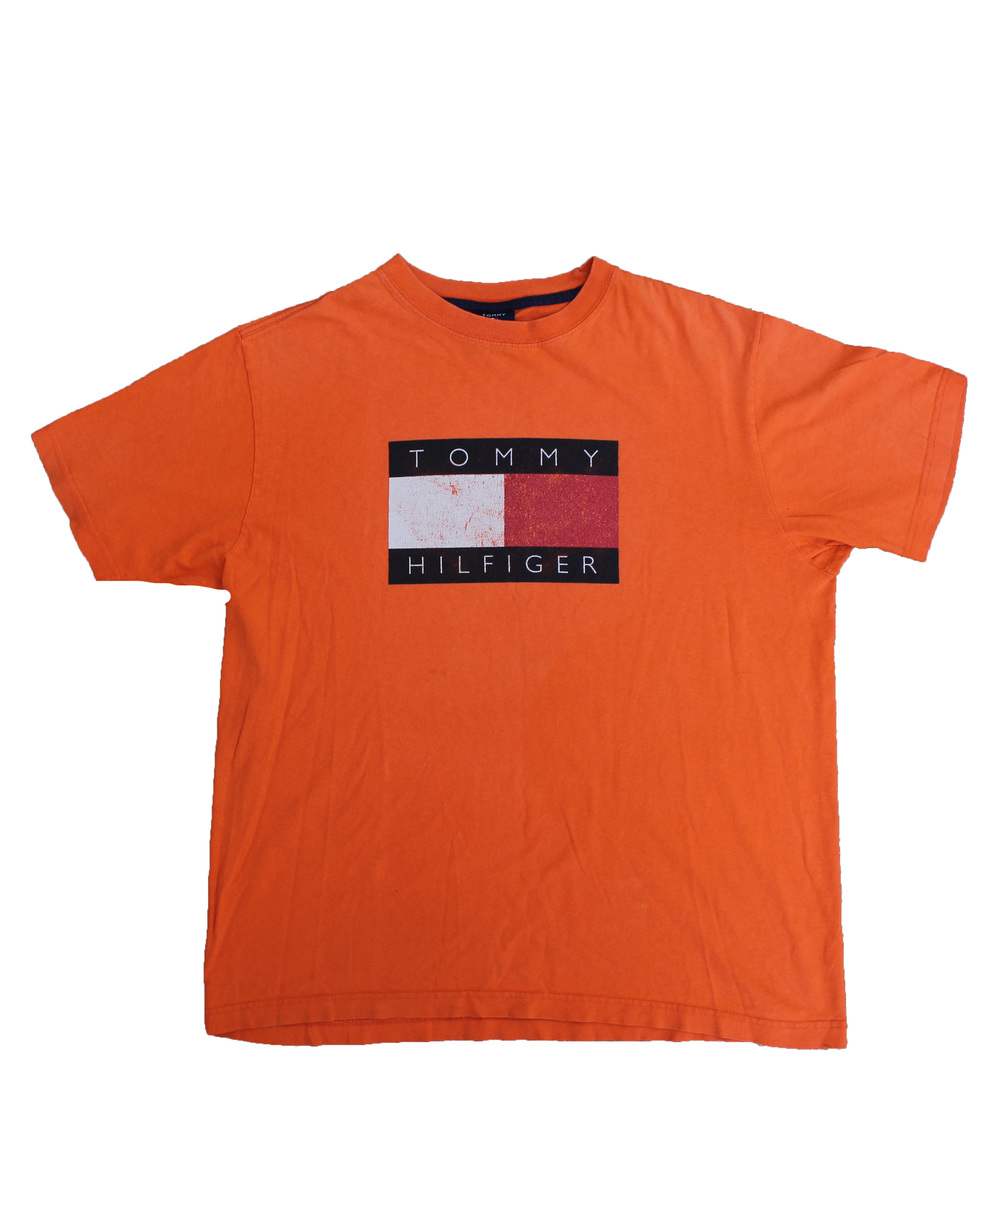 a7867e14 Vintage 90s Tommy Hilfiger orange logo t shirt.